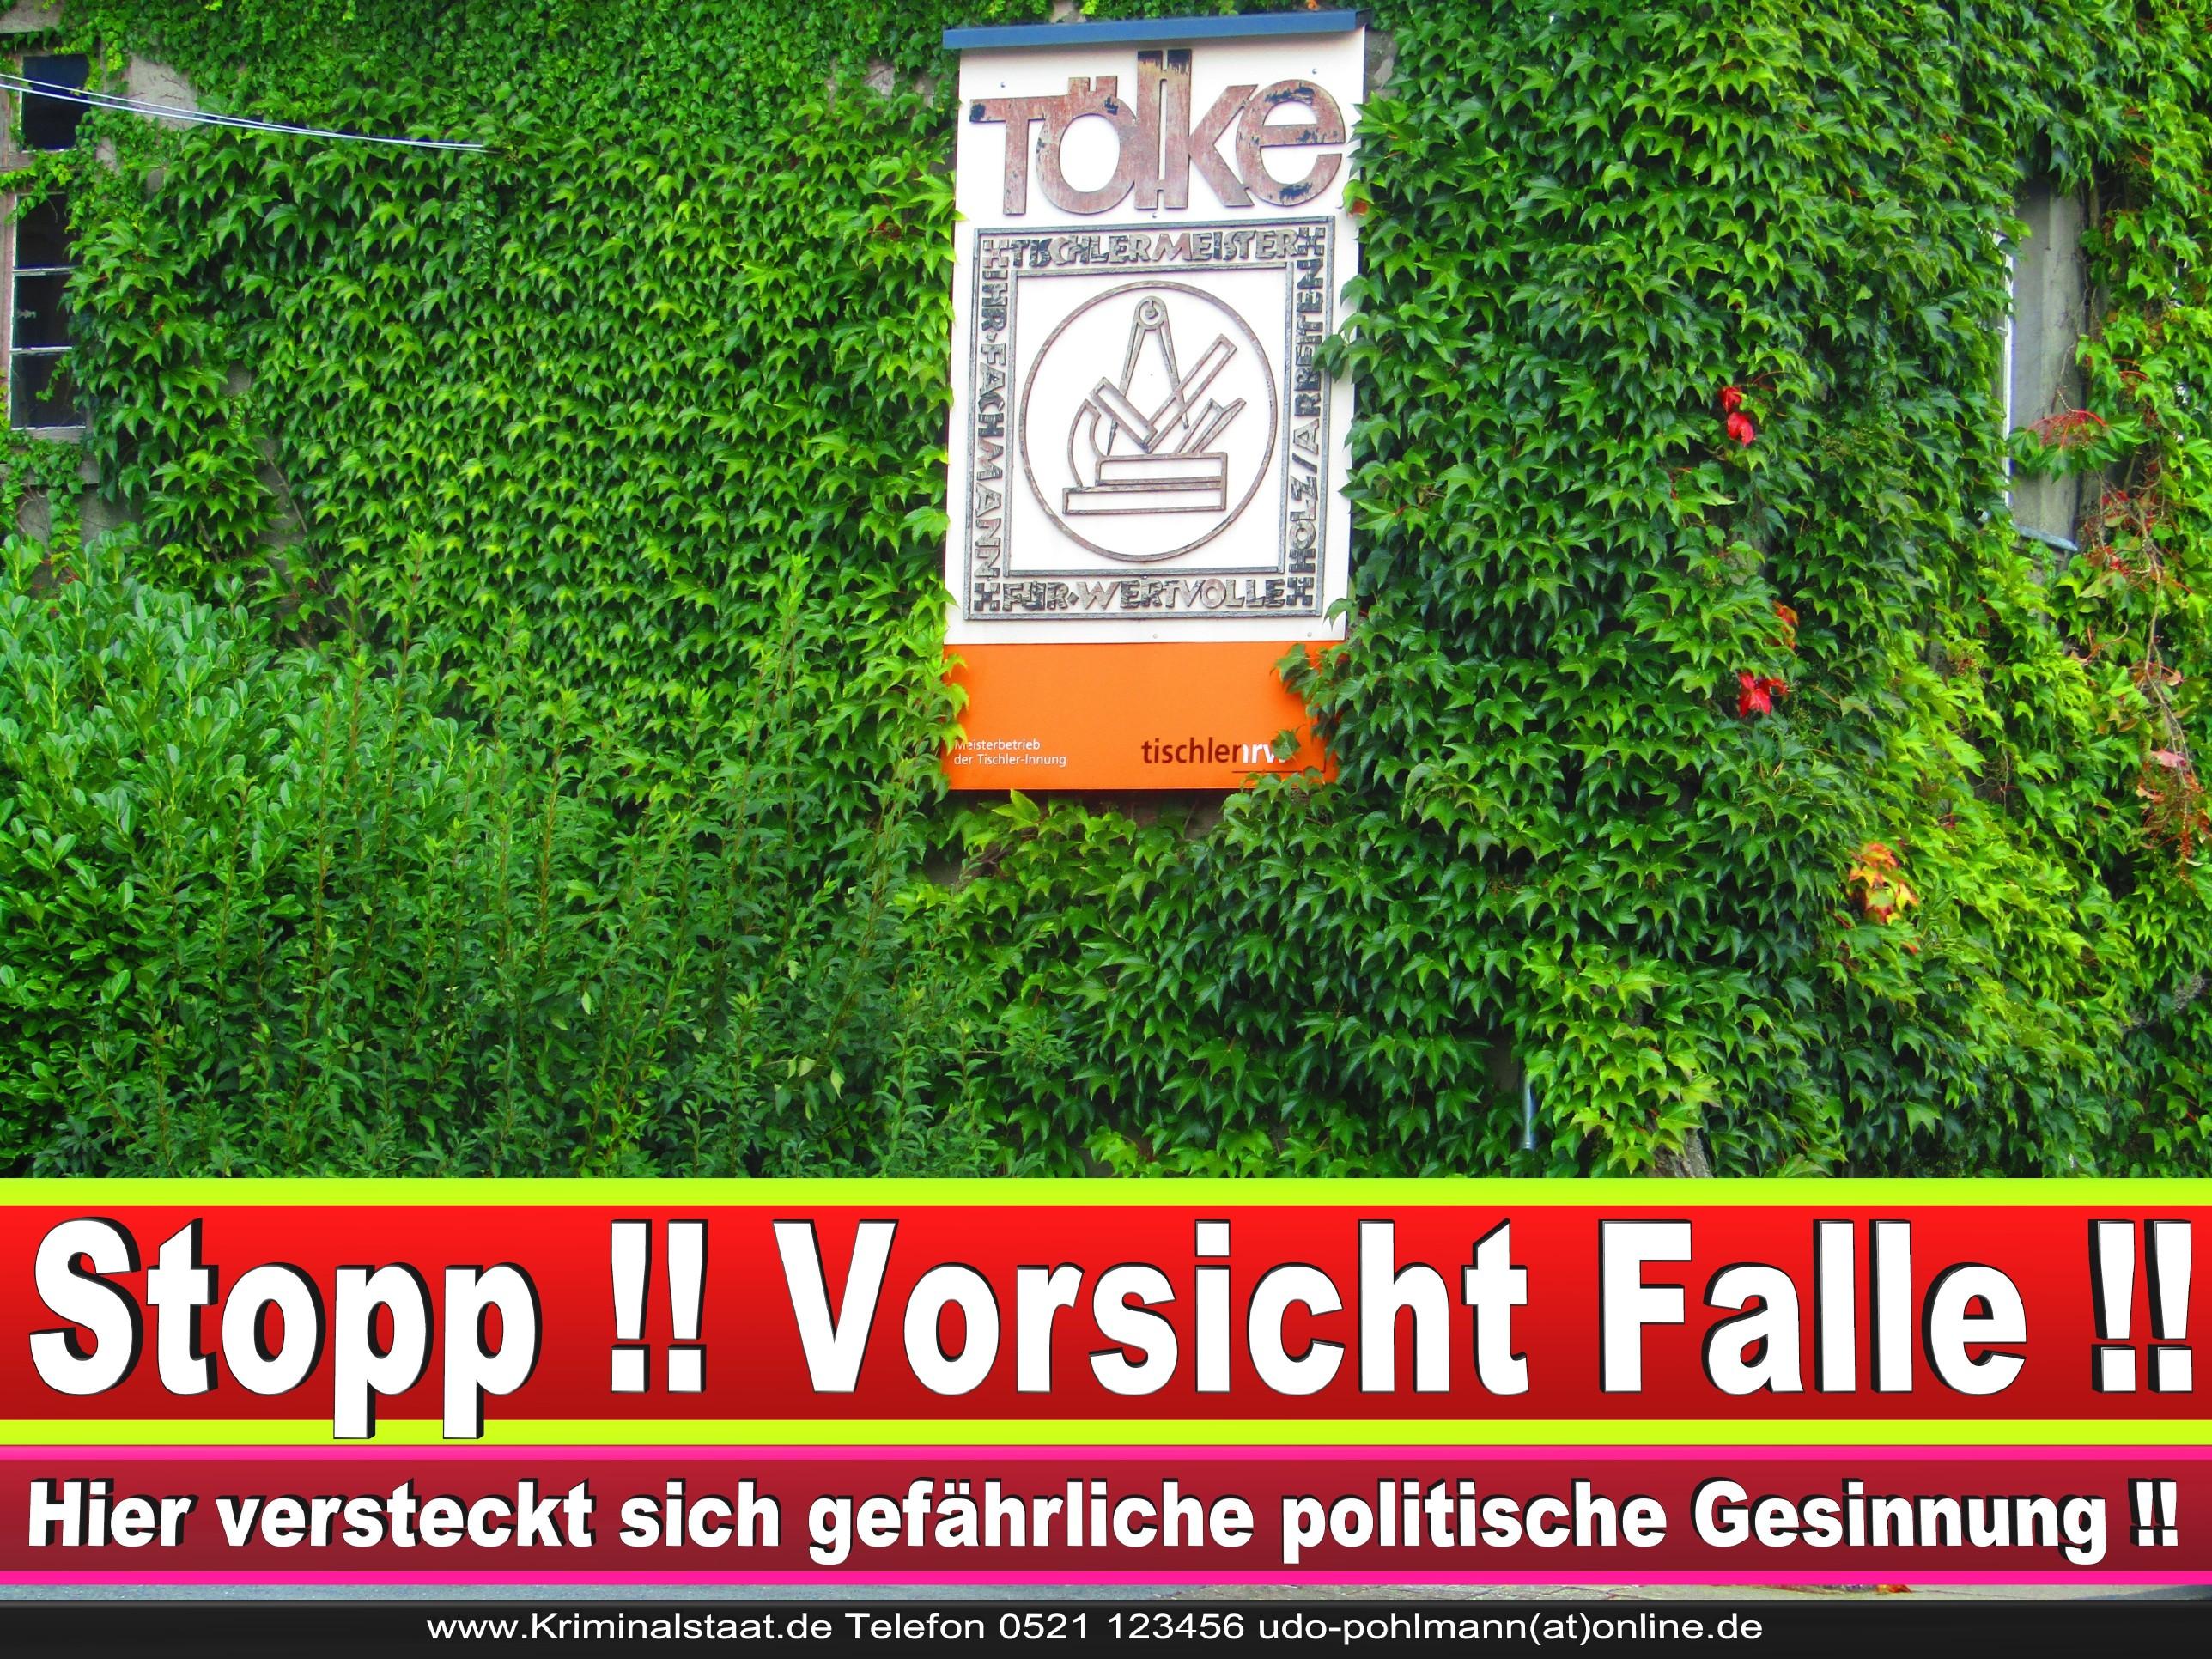 TISCHLEREI TOELKE CDU BIELEFELD TÖLKE 3 LANDTAGSWAHL BUNDESTAGSWAHL BÜRGERMEISTERWAHL